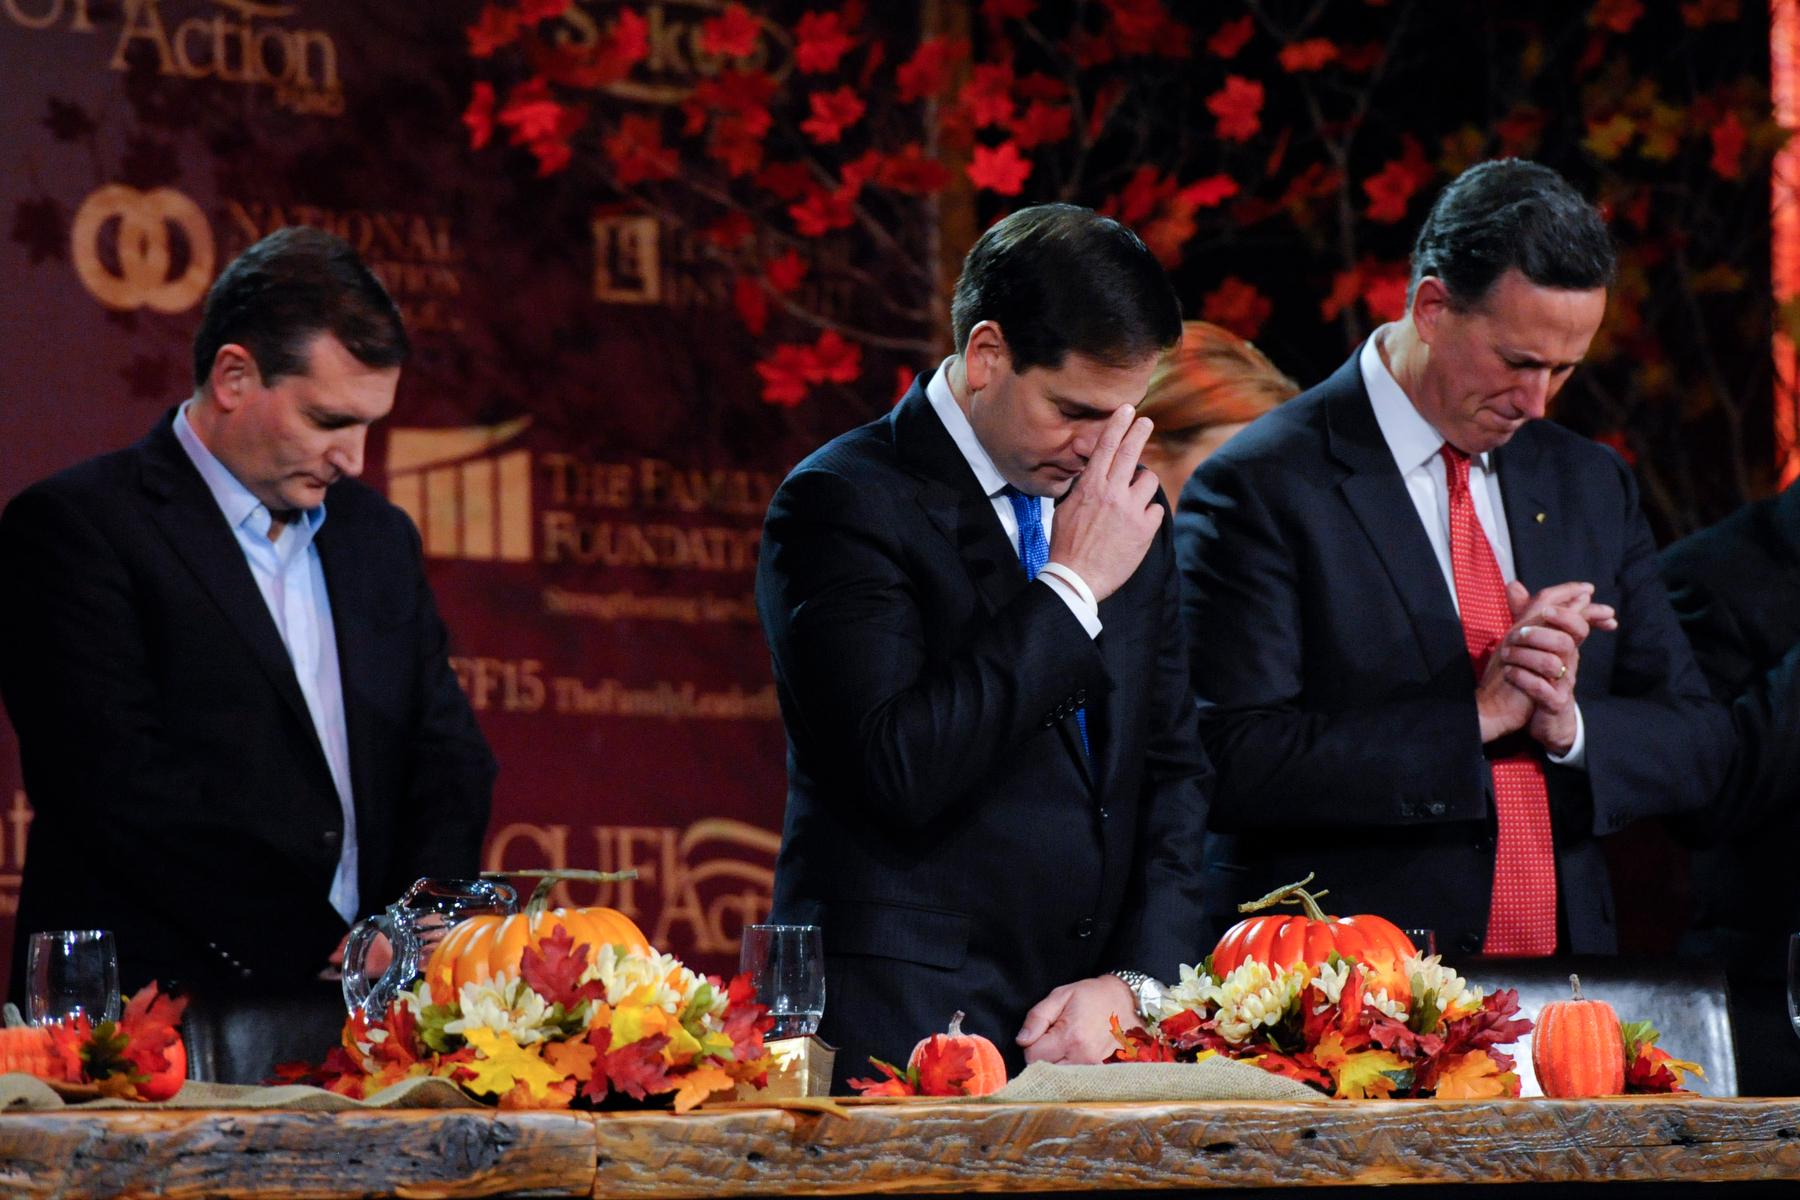 Republican U.S. presidential candidates Ted Cruz, Marco Rubio, and Rick Santorum pray at the Presidential Family Forum in Des Moines, Iowa November 20, 2015. REUTERS/Mark Kauzlarich